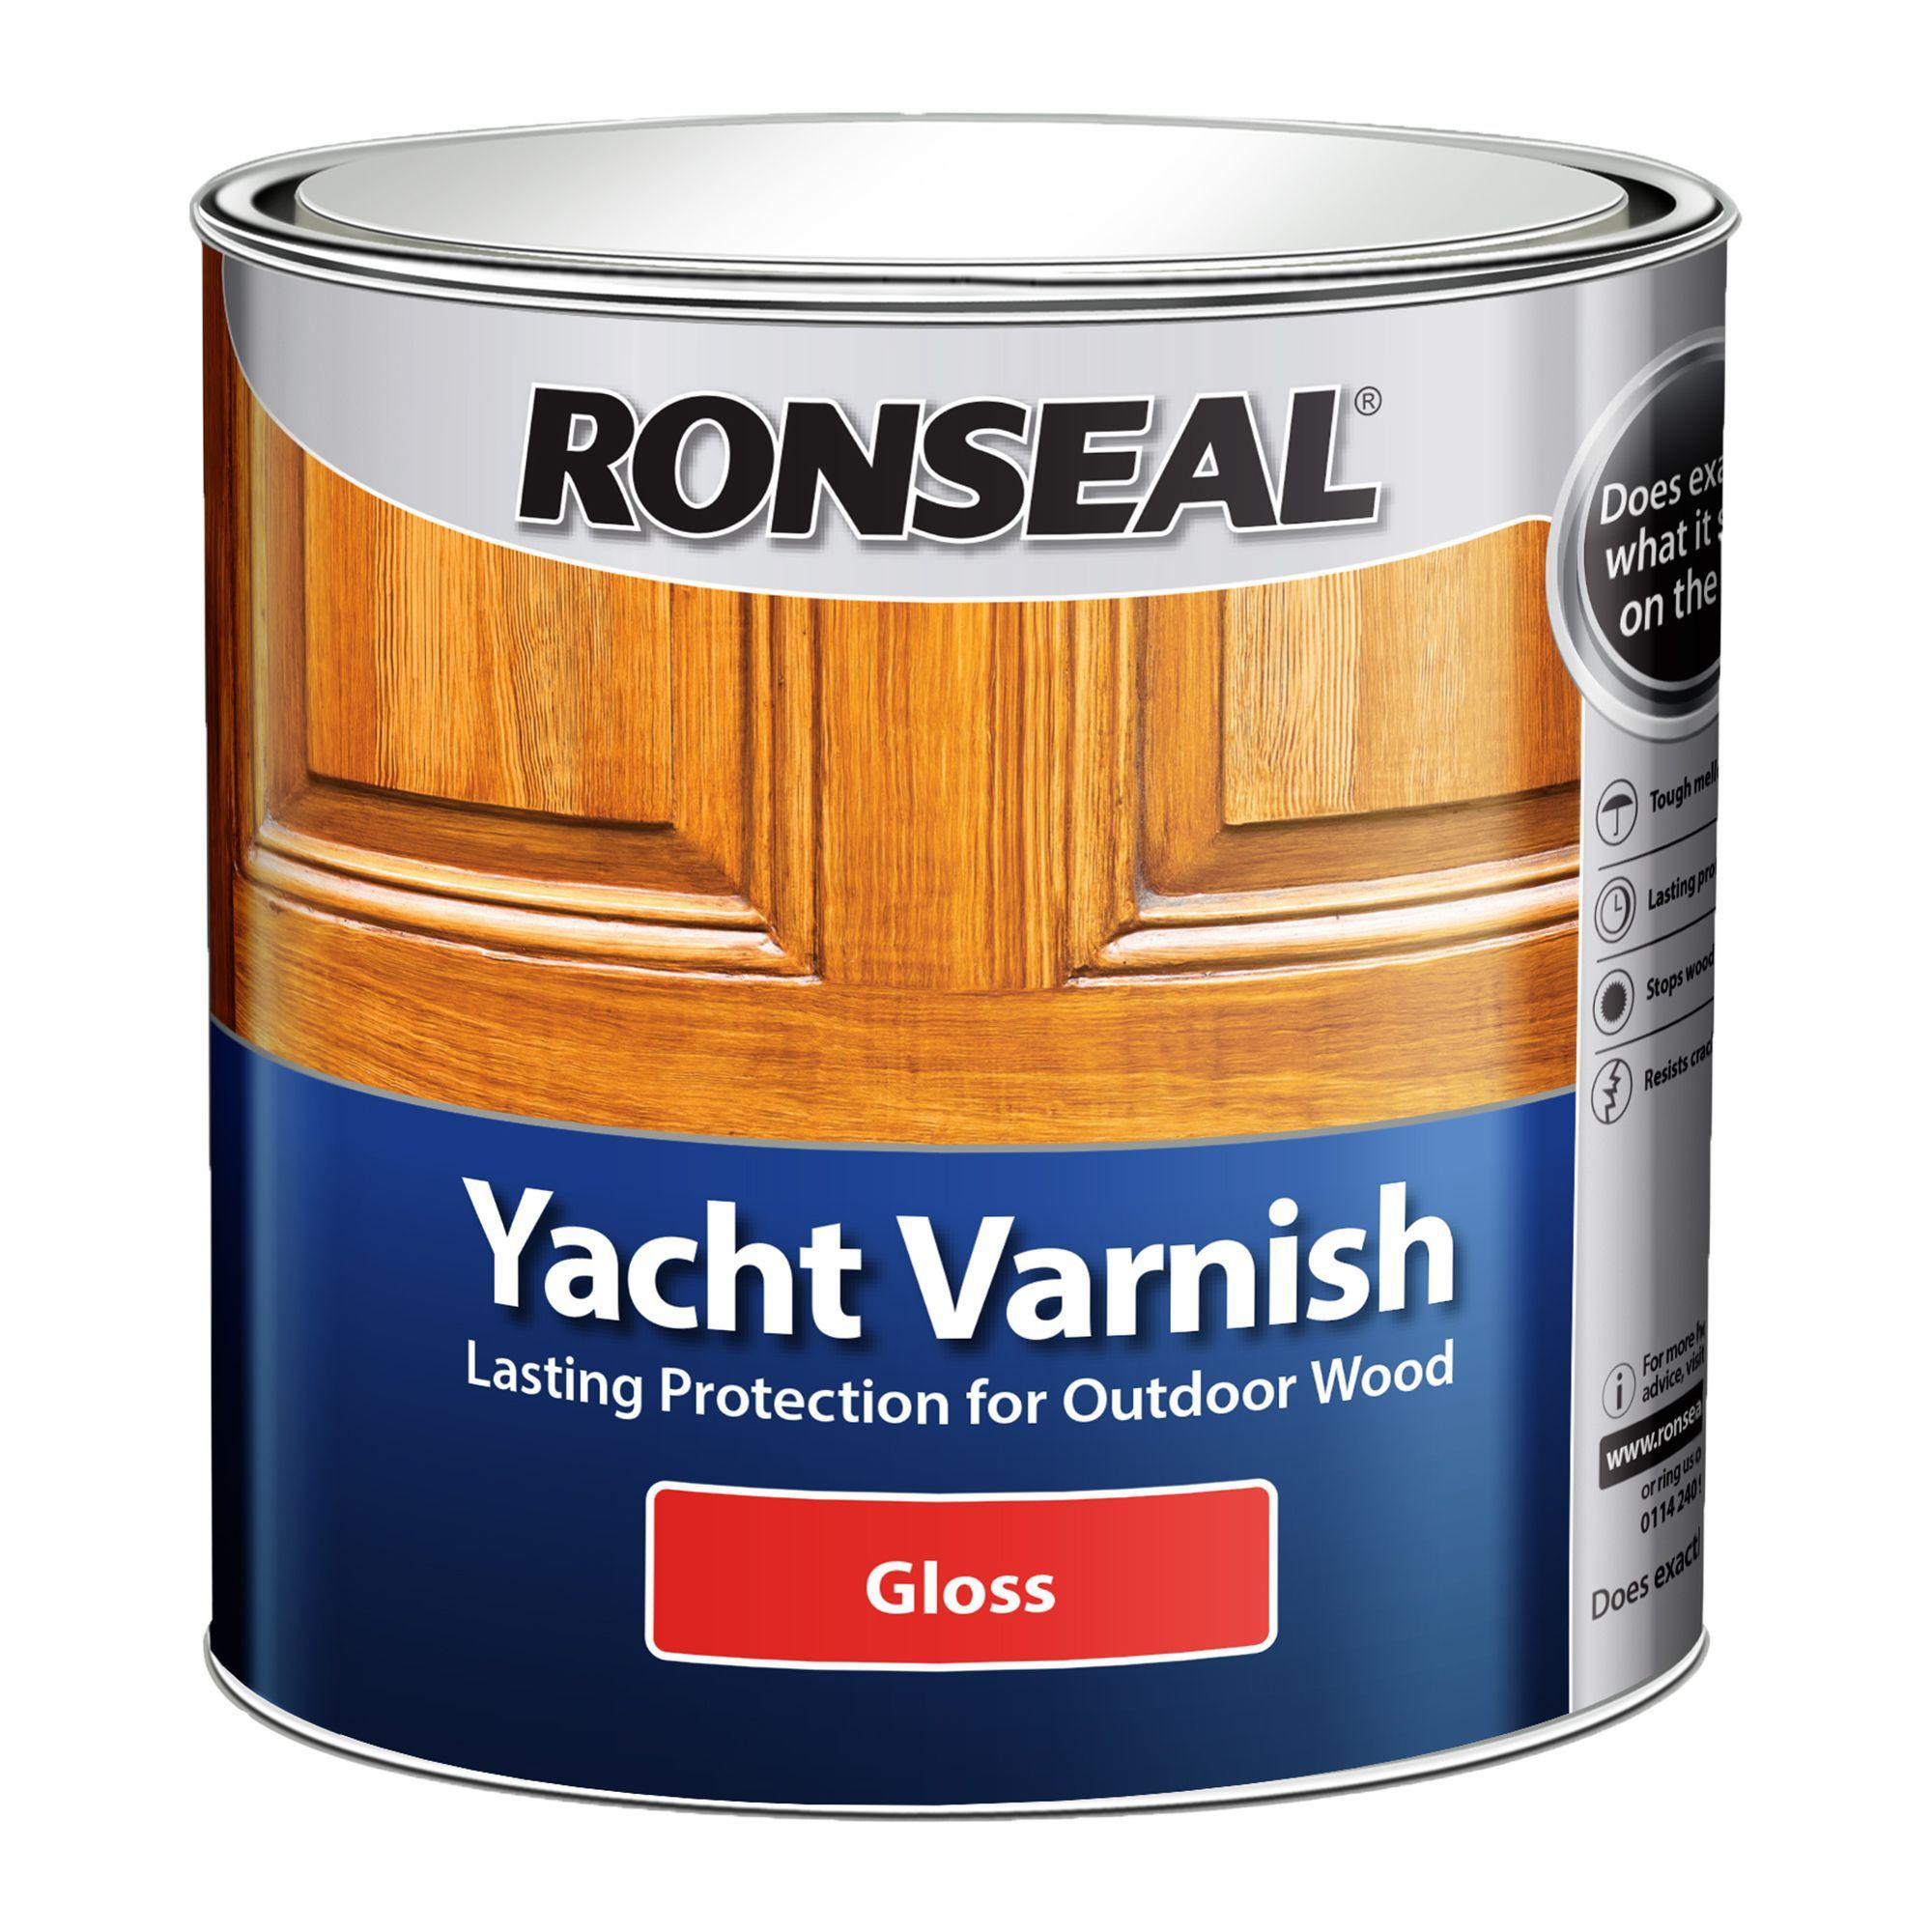 Ronseal Yacht Varnish Gloss 2.5L